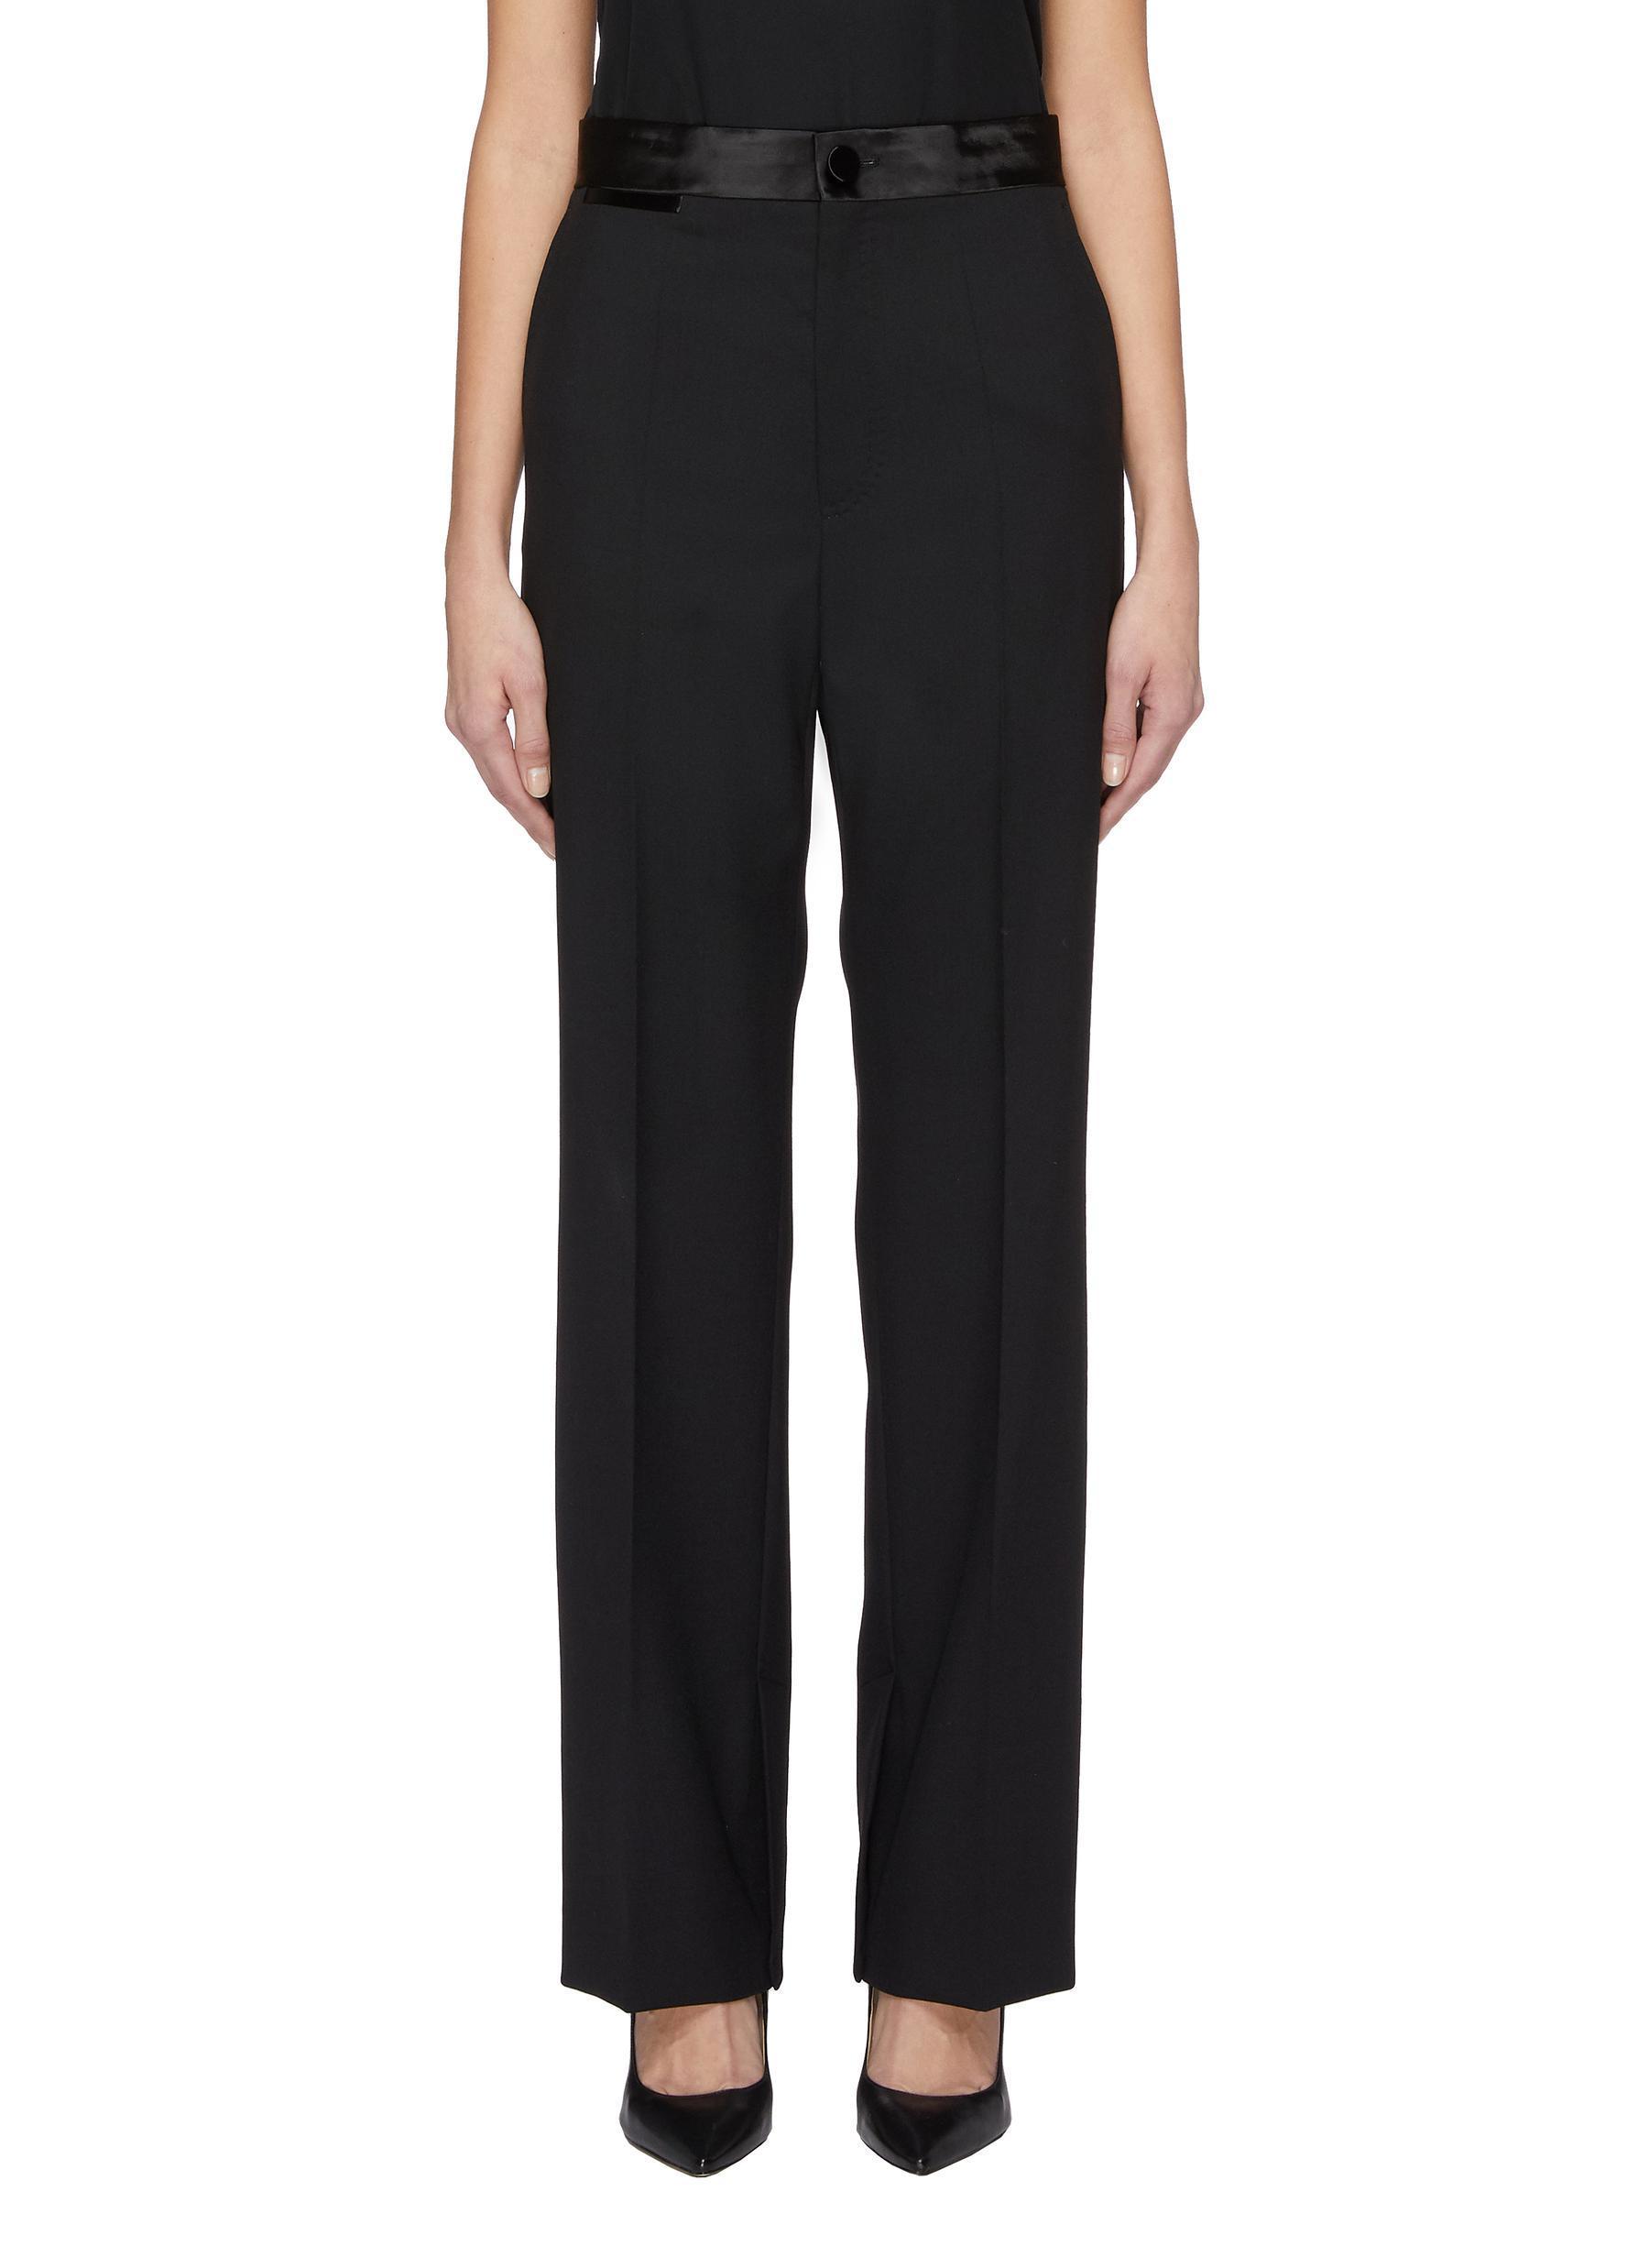 3af9ca0c3014e Lyst - Helmut Lang Virgin Wool-mohair Canvas Tuxedo Pants in Black